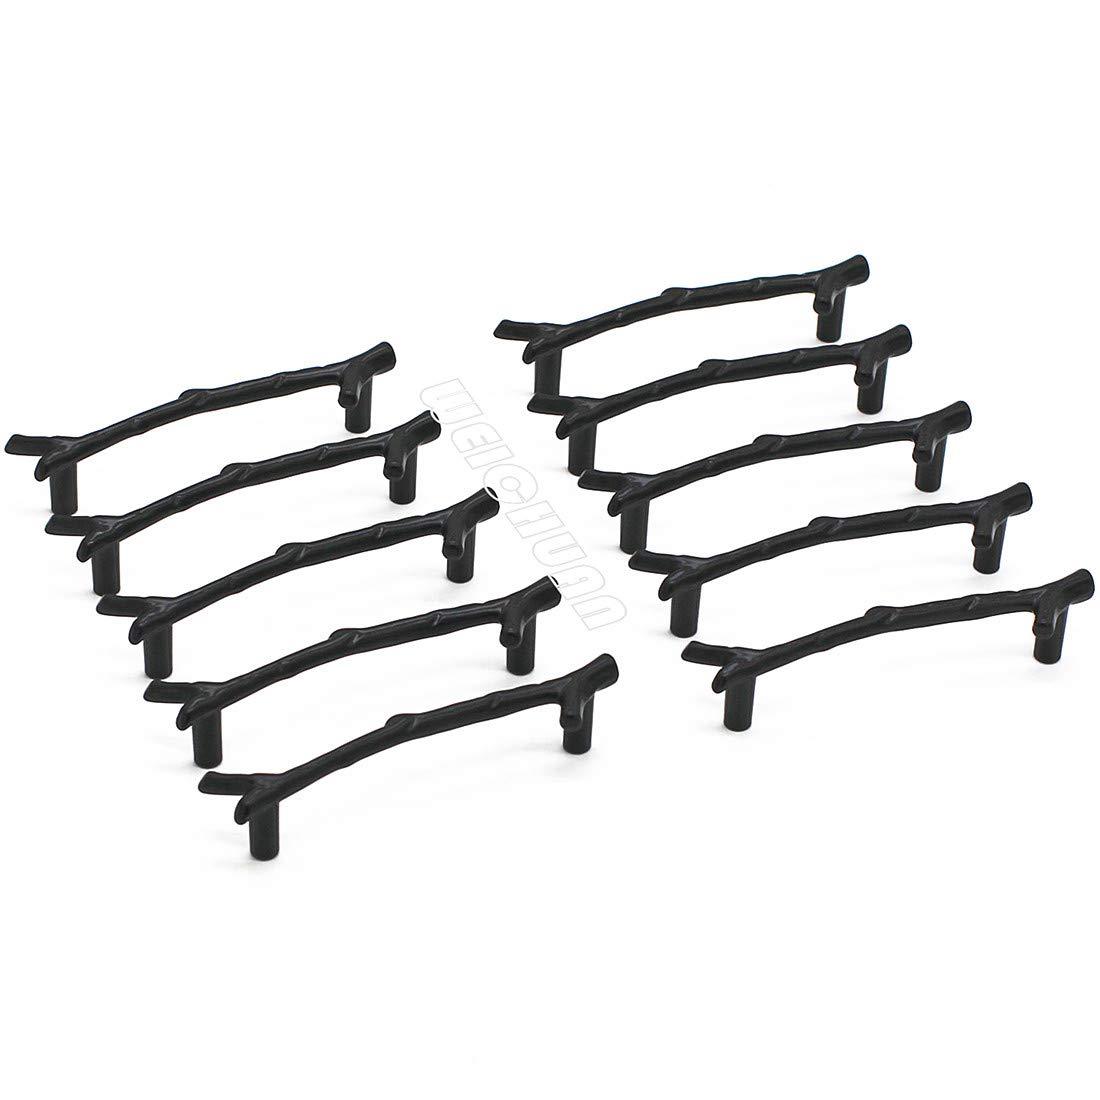 WEICHUAN 10PCS Zinc Alloy Black Twig Branch Zinc Alloy Decorative Cabinet Wardrobe Furniture Door Drawer Knobs Pulls Handles Hardware Décor (10PCS Black Pulls)